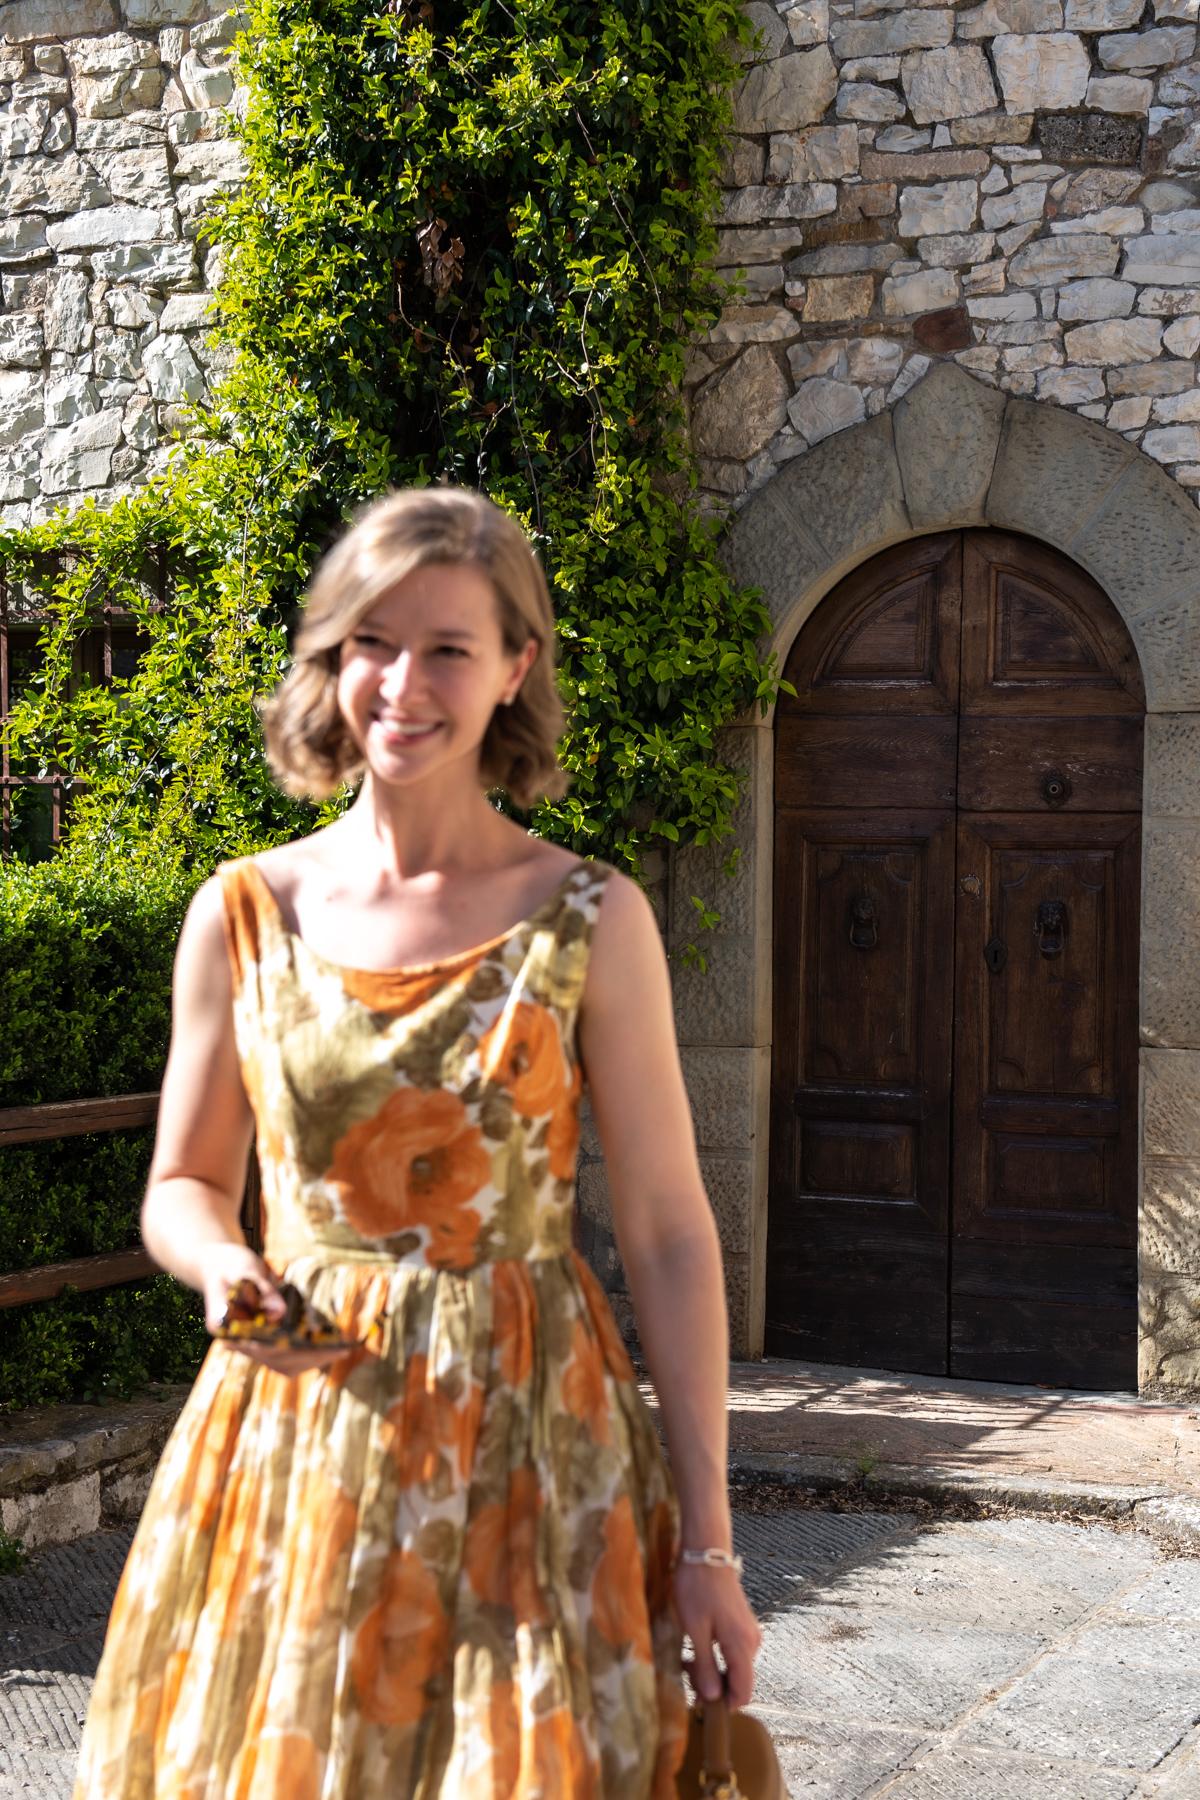 Stacie Flinner x Cuvee Tuscan Farmhouse Tuscany Italy Guide-78.jpg